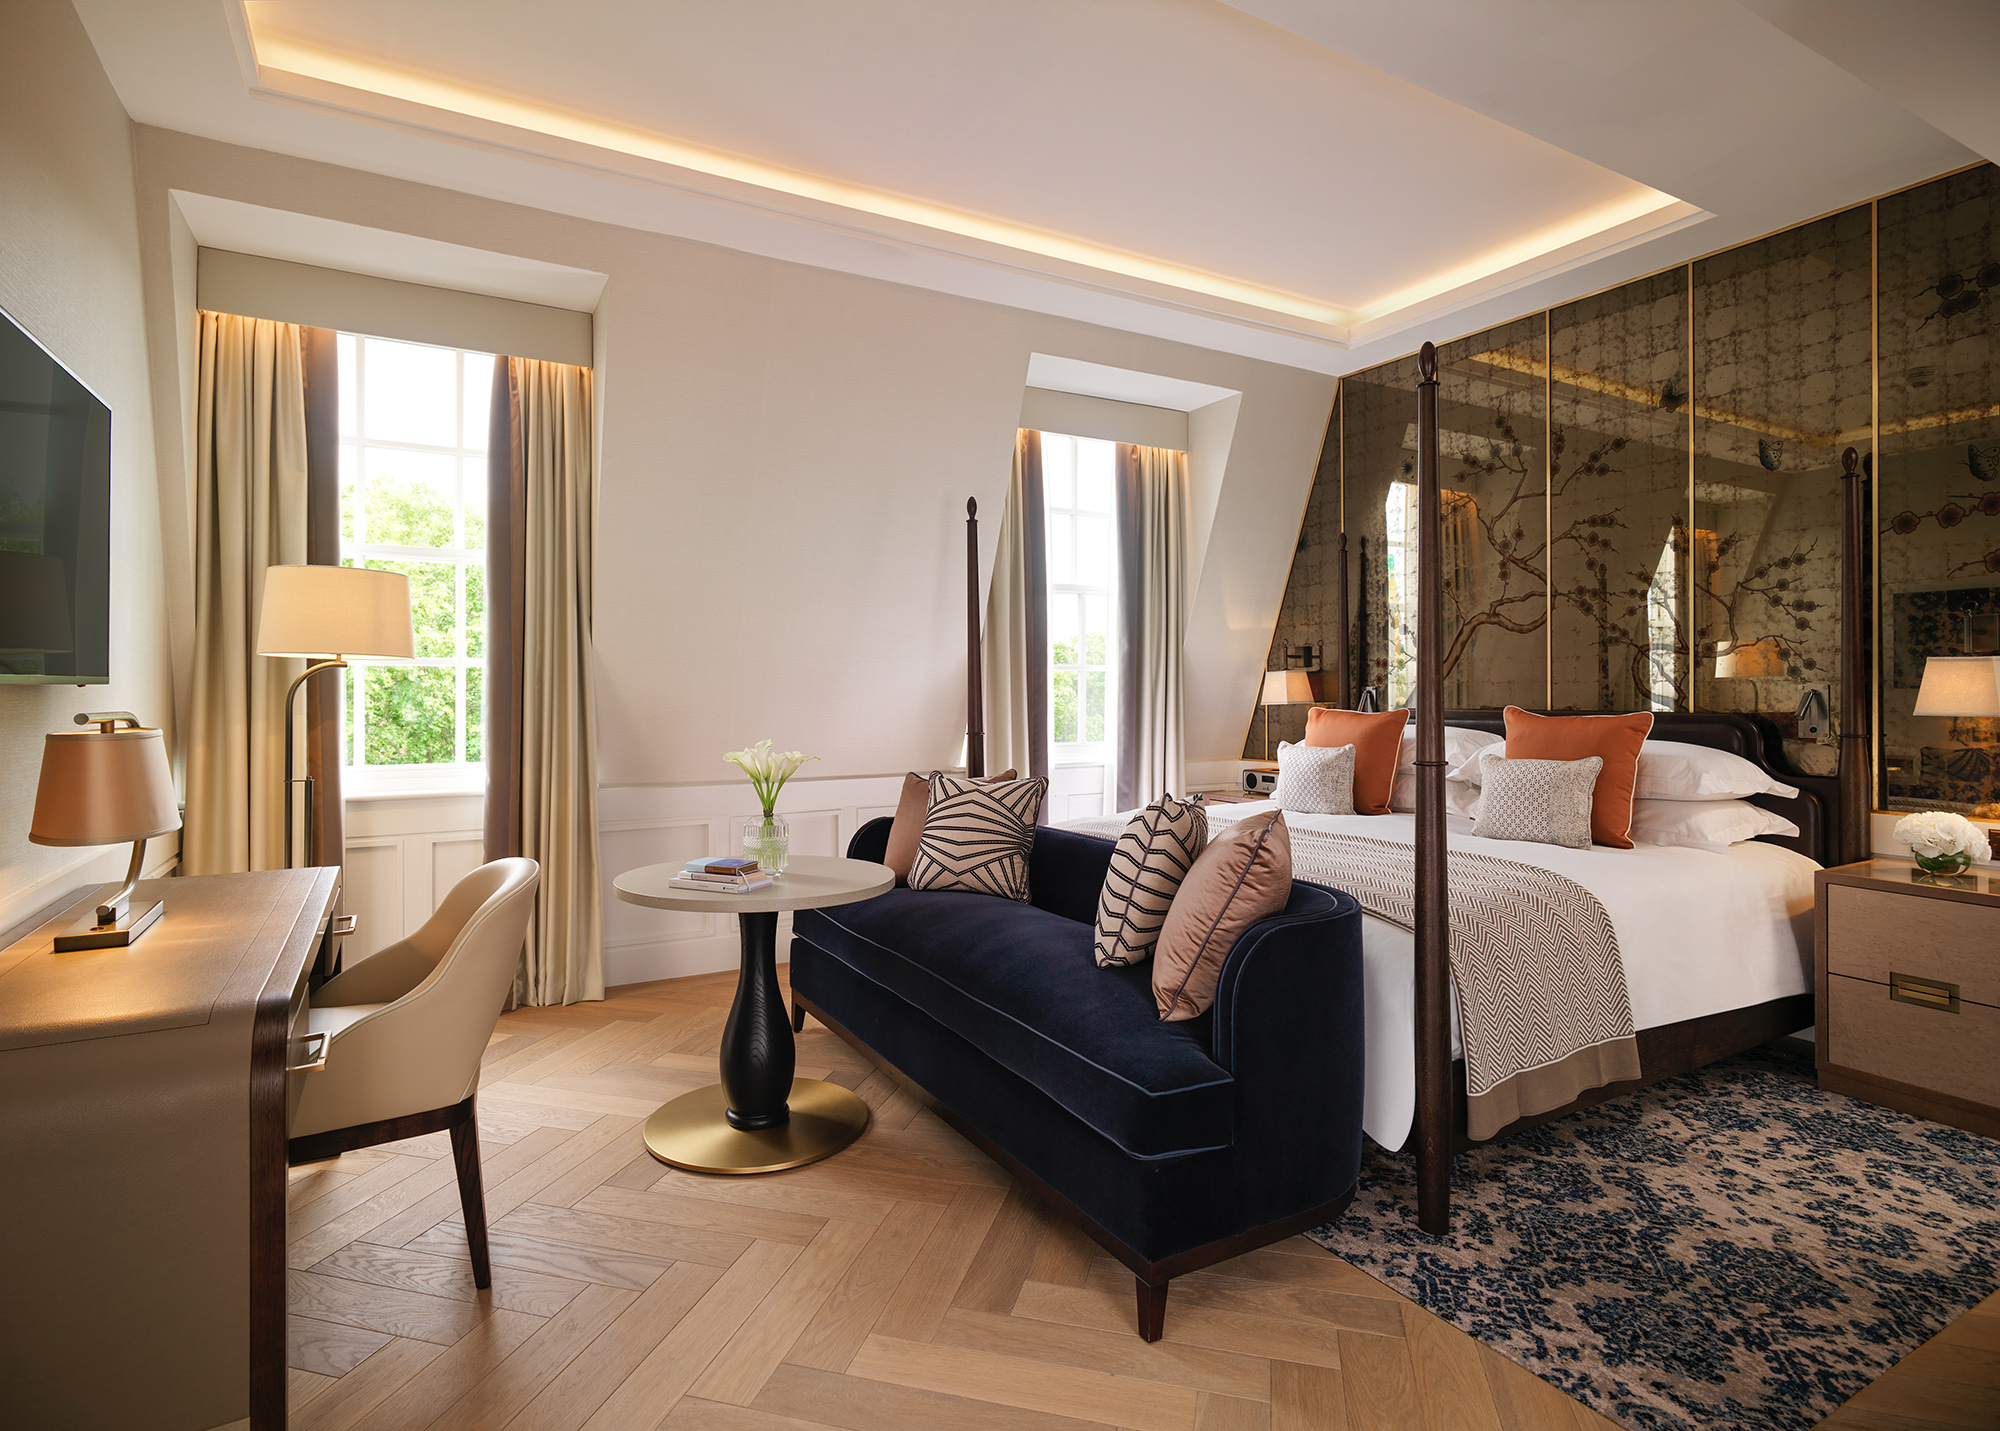 The Biltmore Grosvenor Square View Suite has impressive views over Regency Mayfair